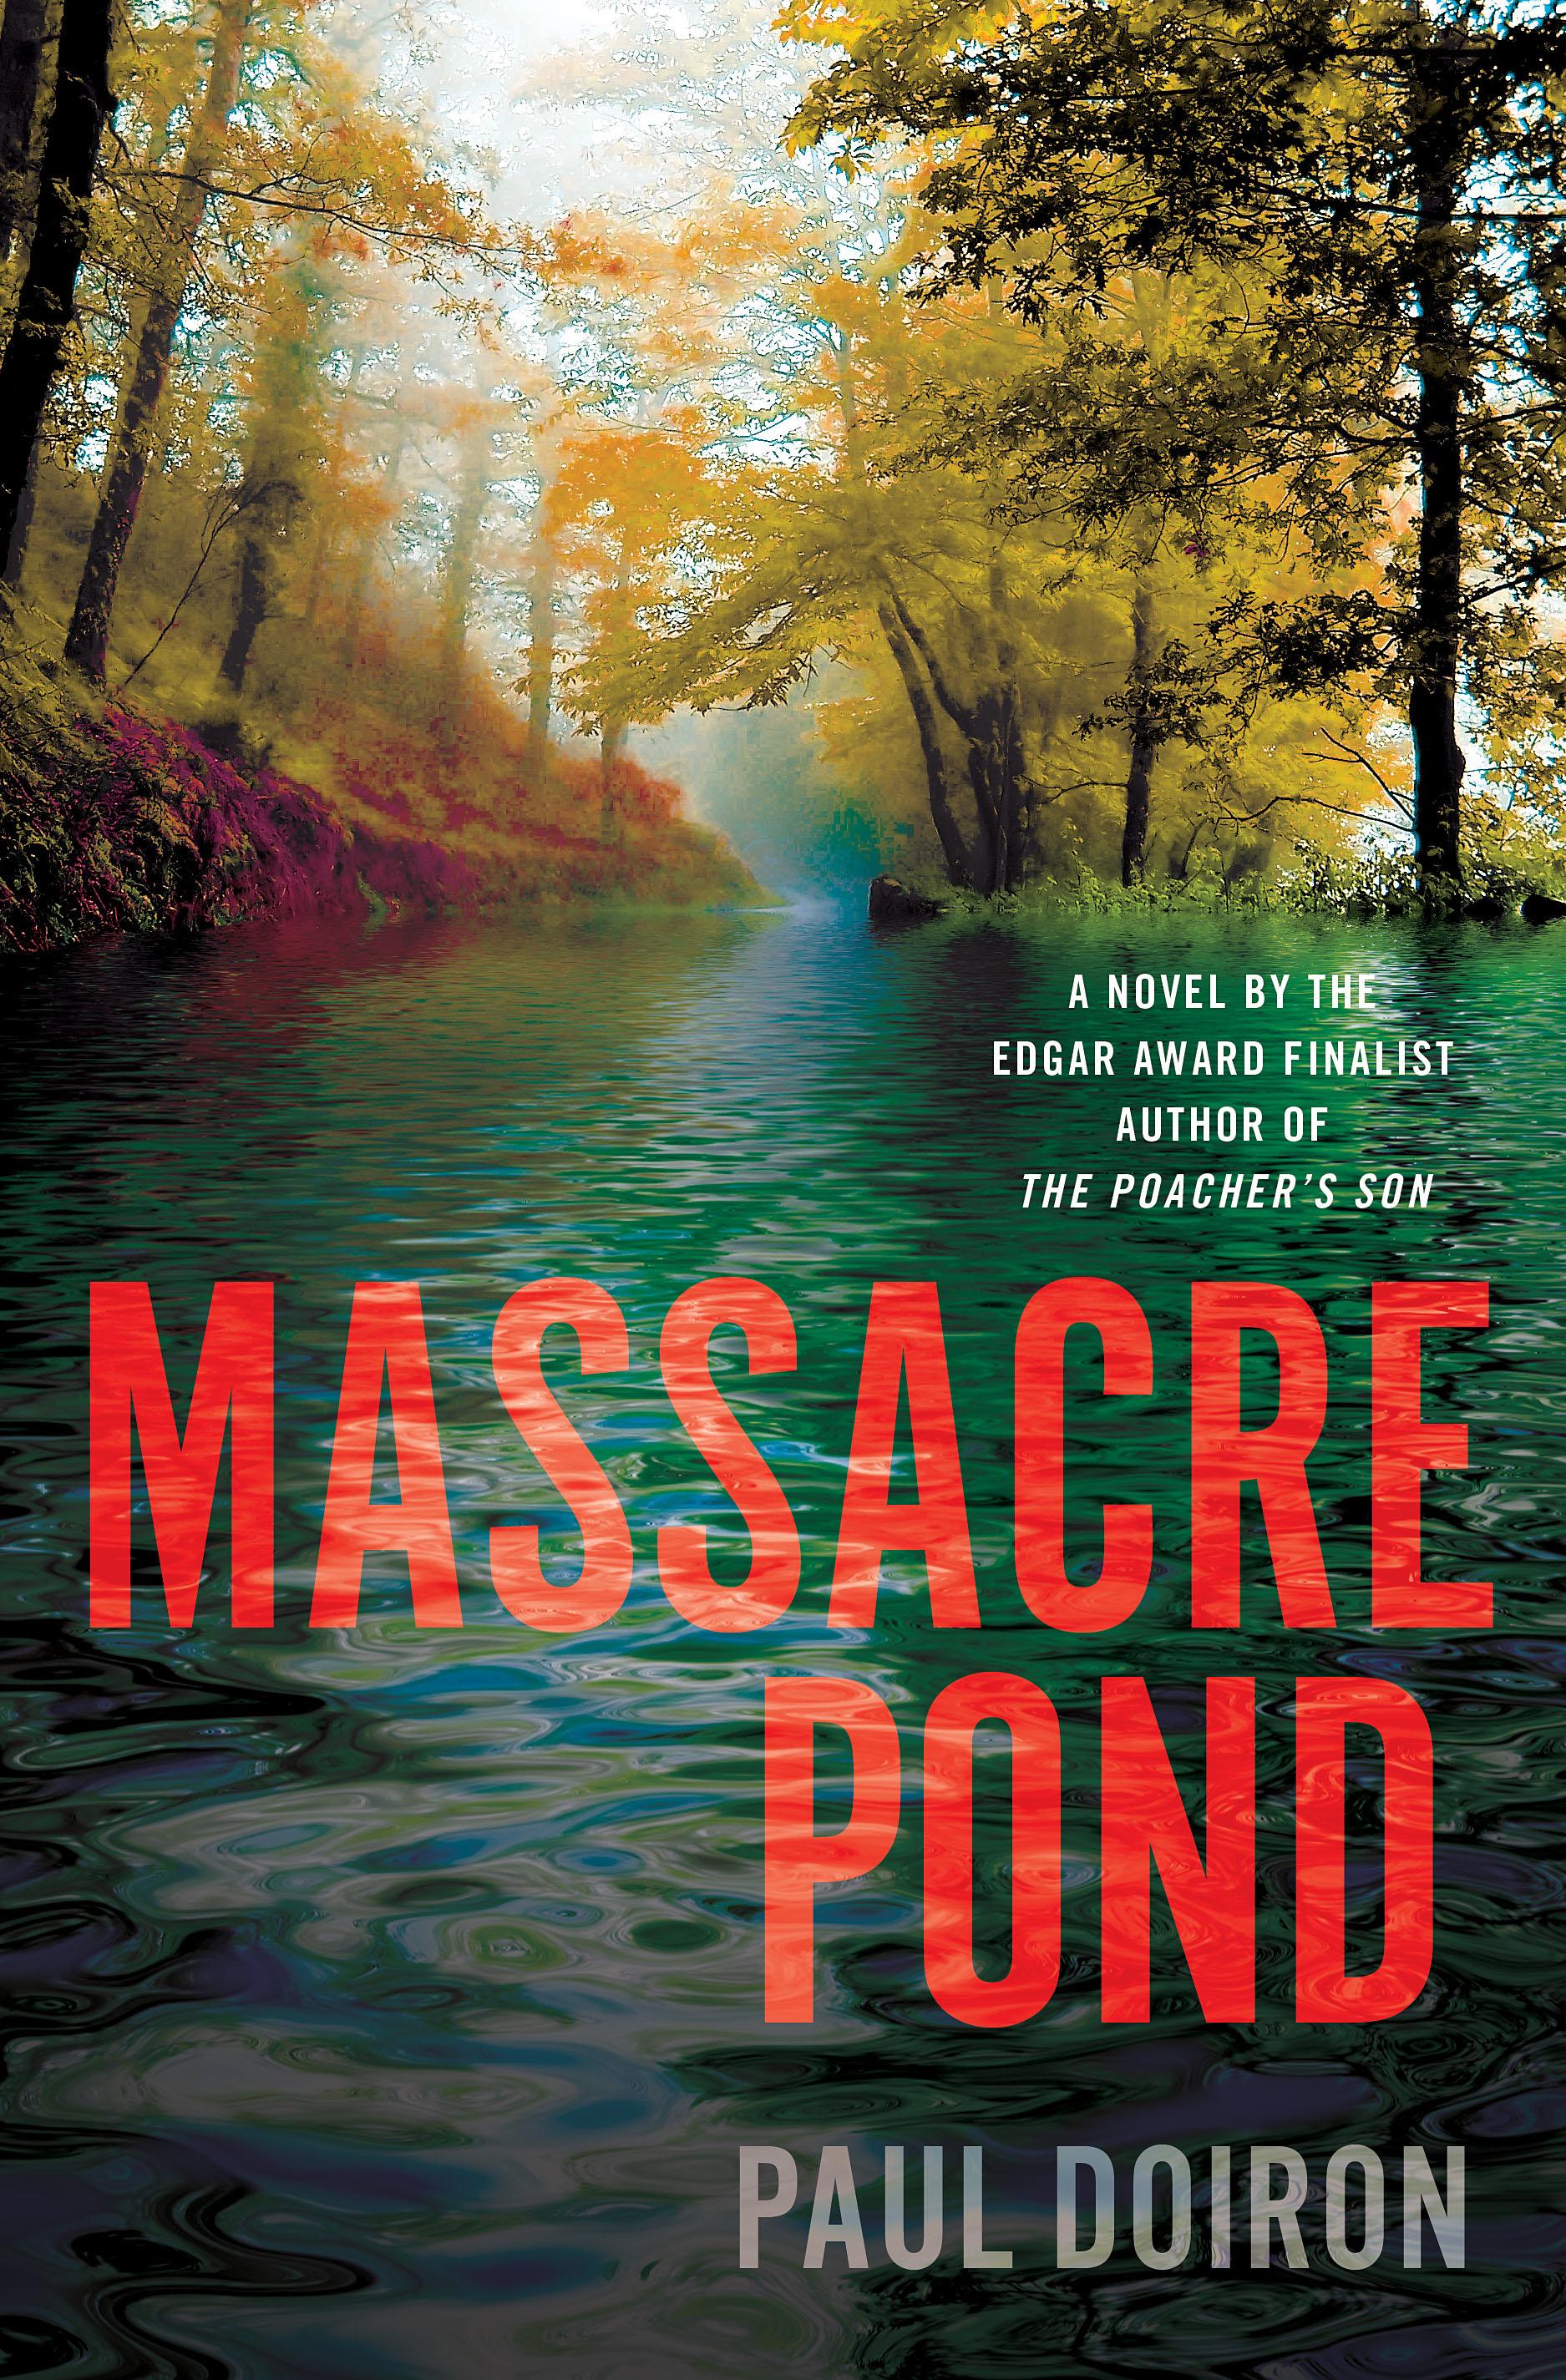 massacre pond copy.jpg